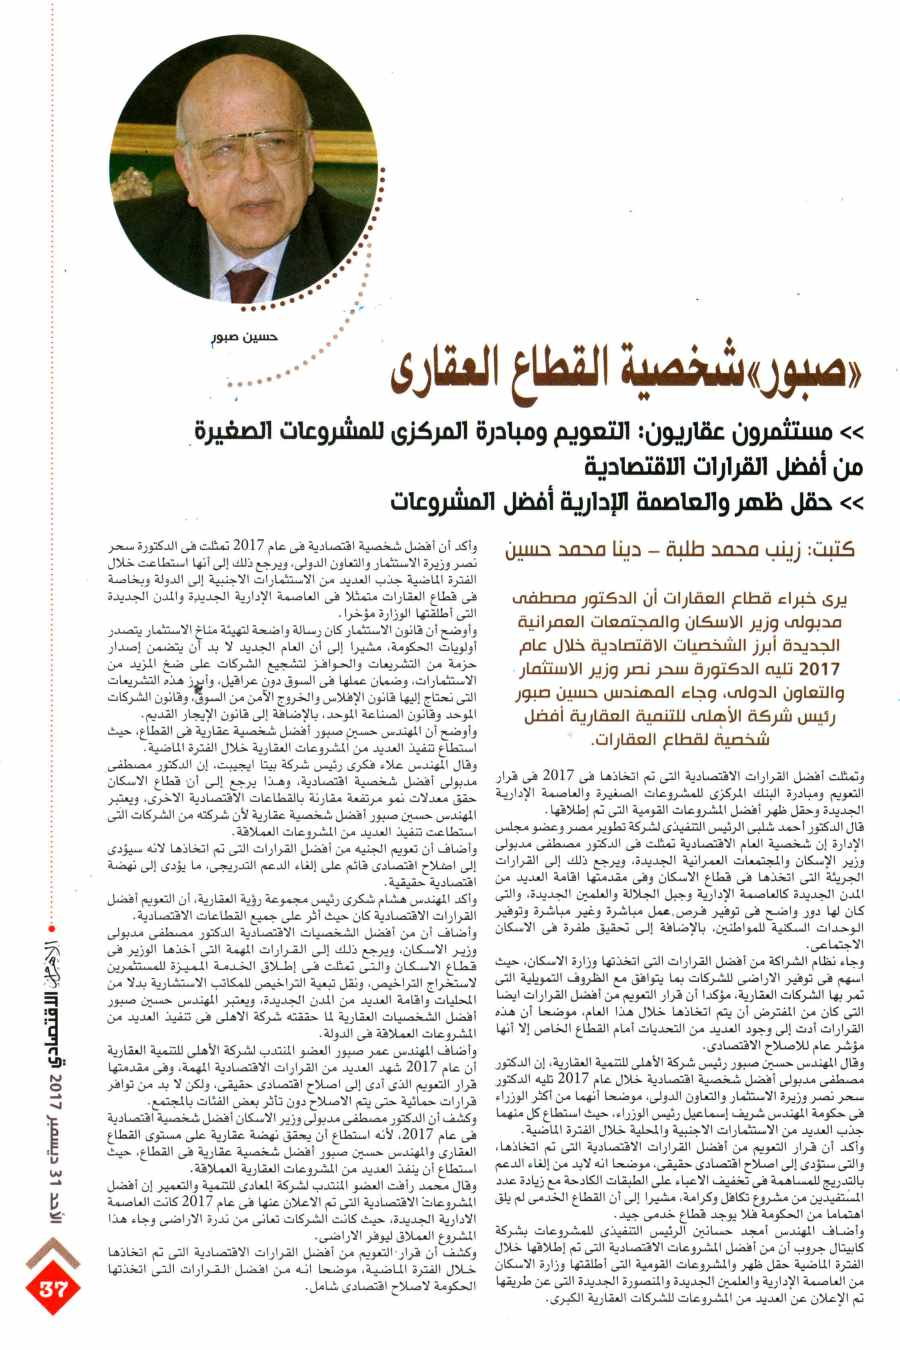 Al Ahram Al Iktisadi 31 Dec P.37.jpg